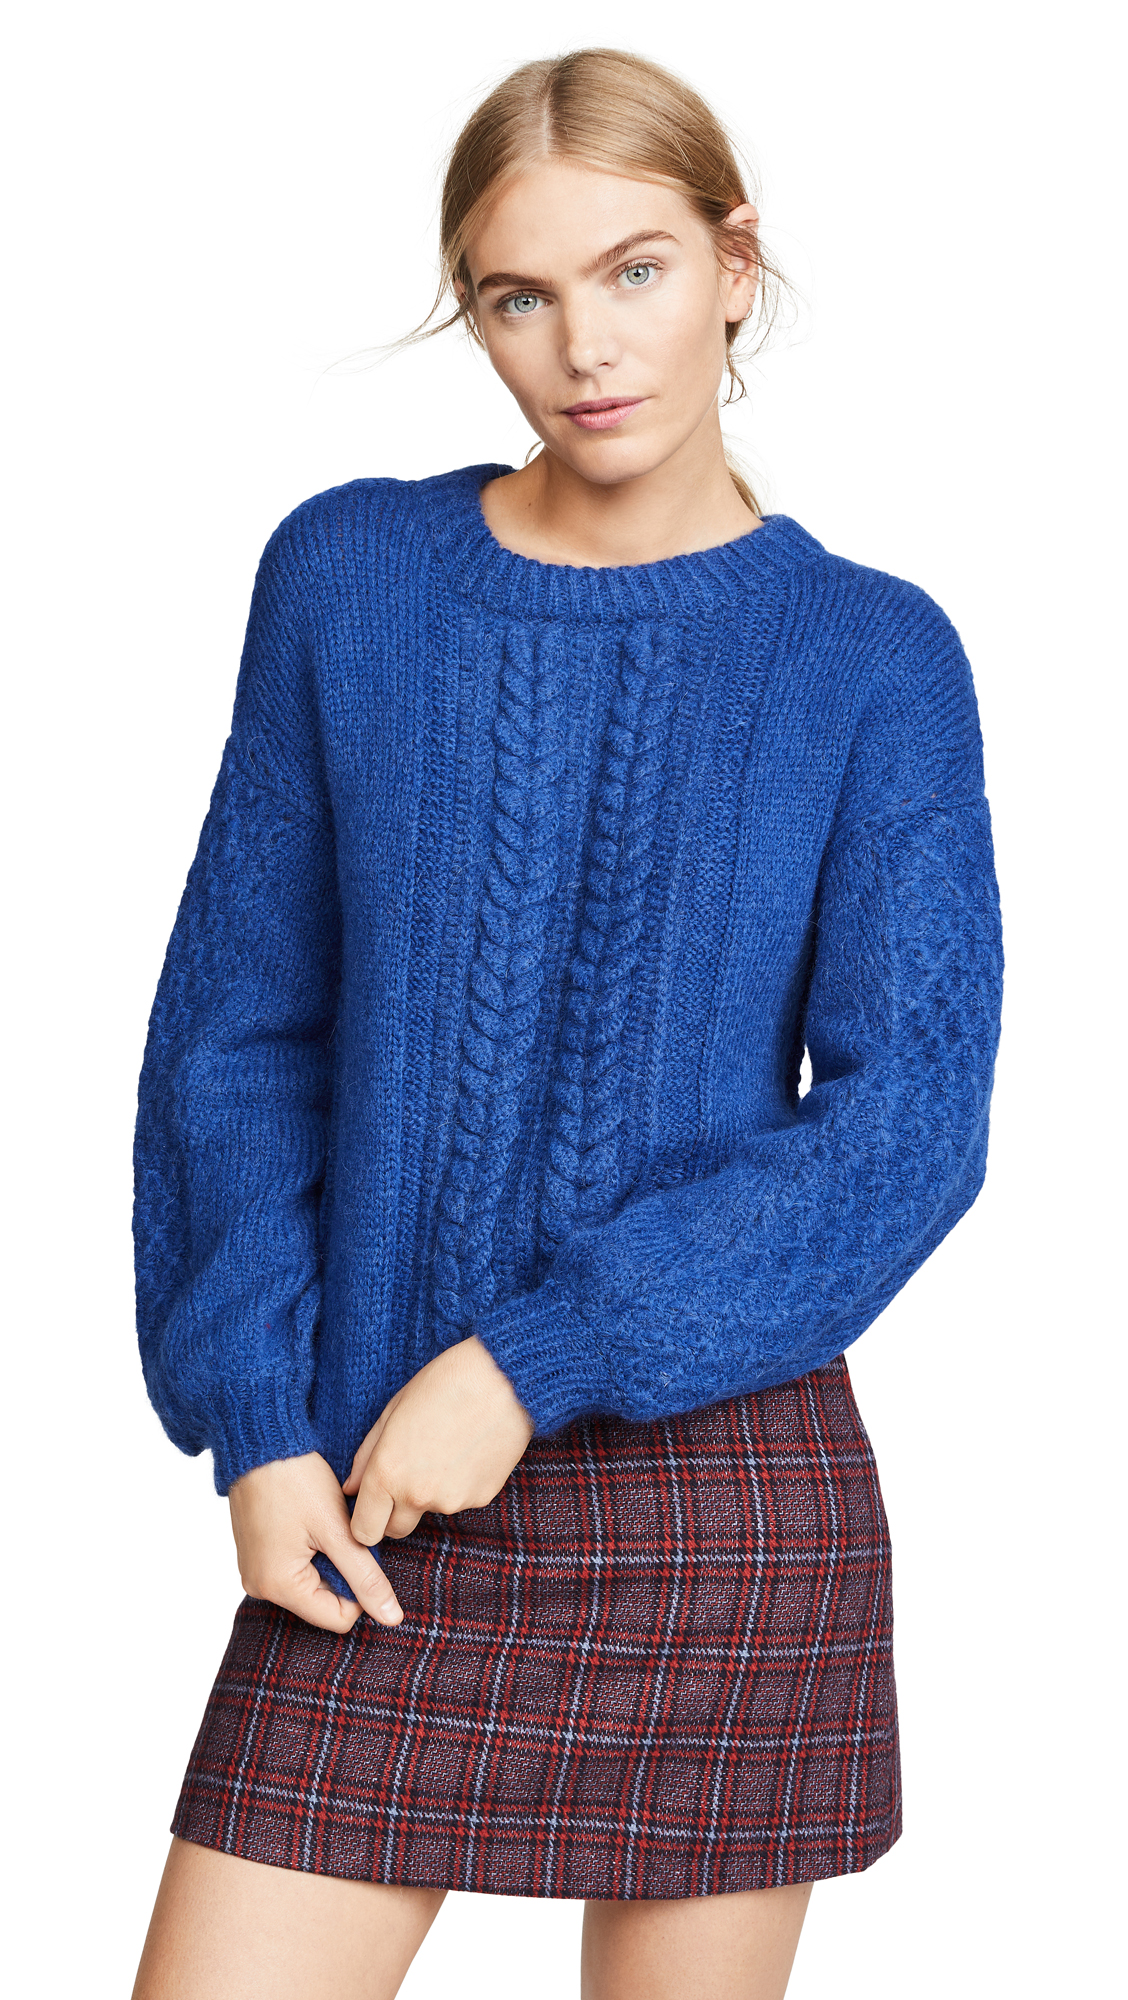 M.PATMOS Anouk Sweater in Cobalt